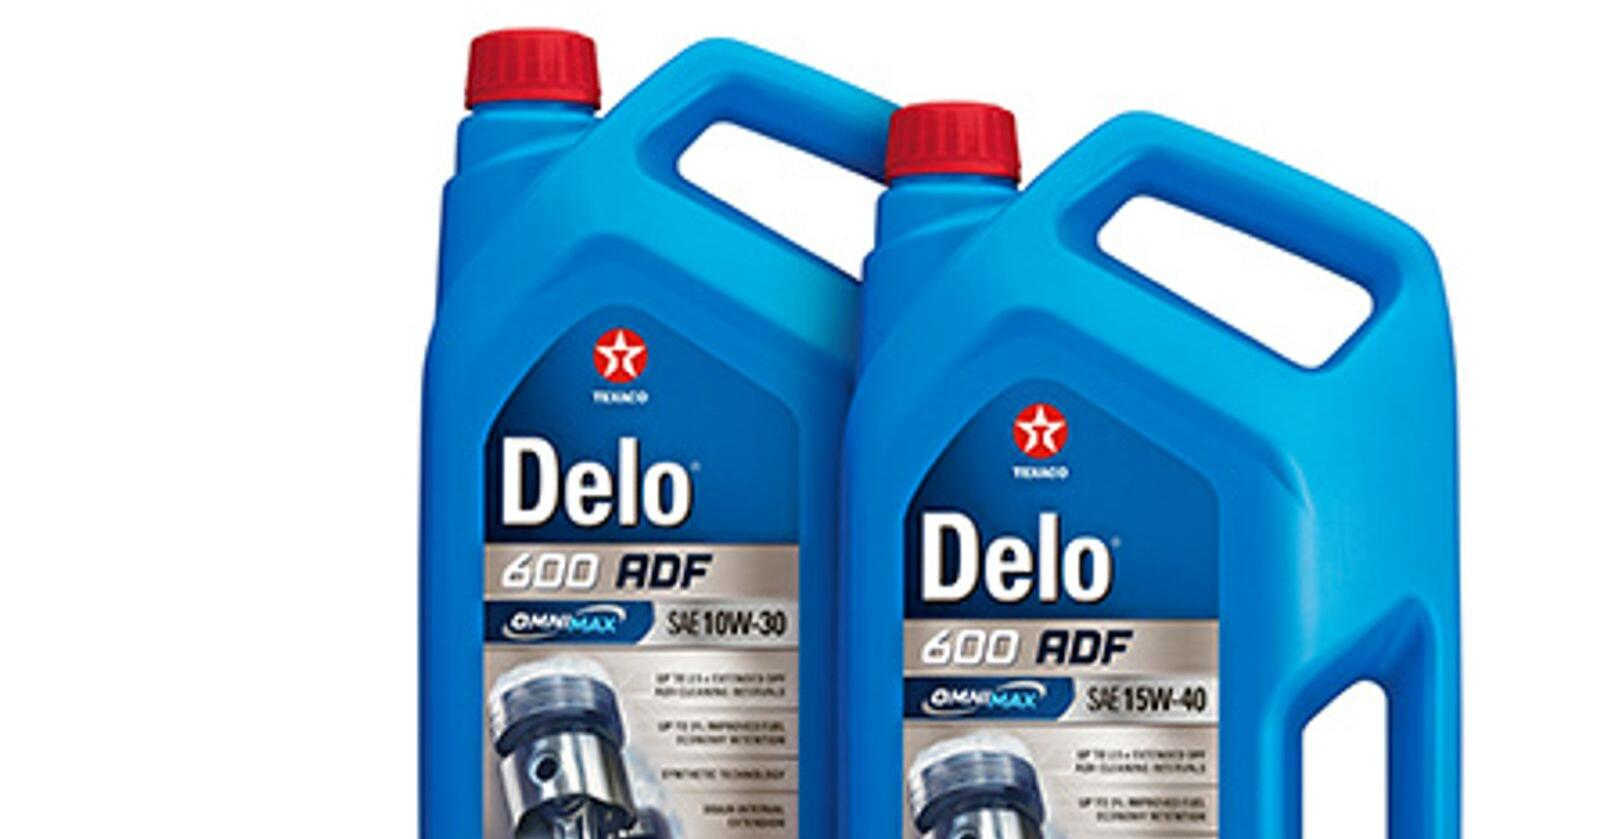 Texaco Delo 600 ADF finnes i viskositetene 10W30 og 15W-40